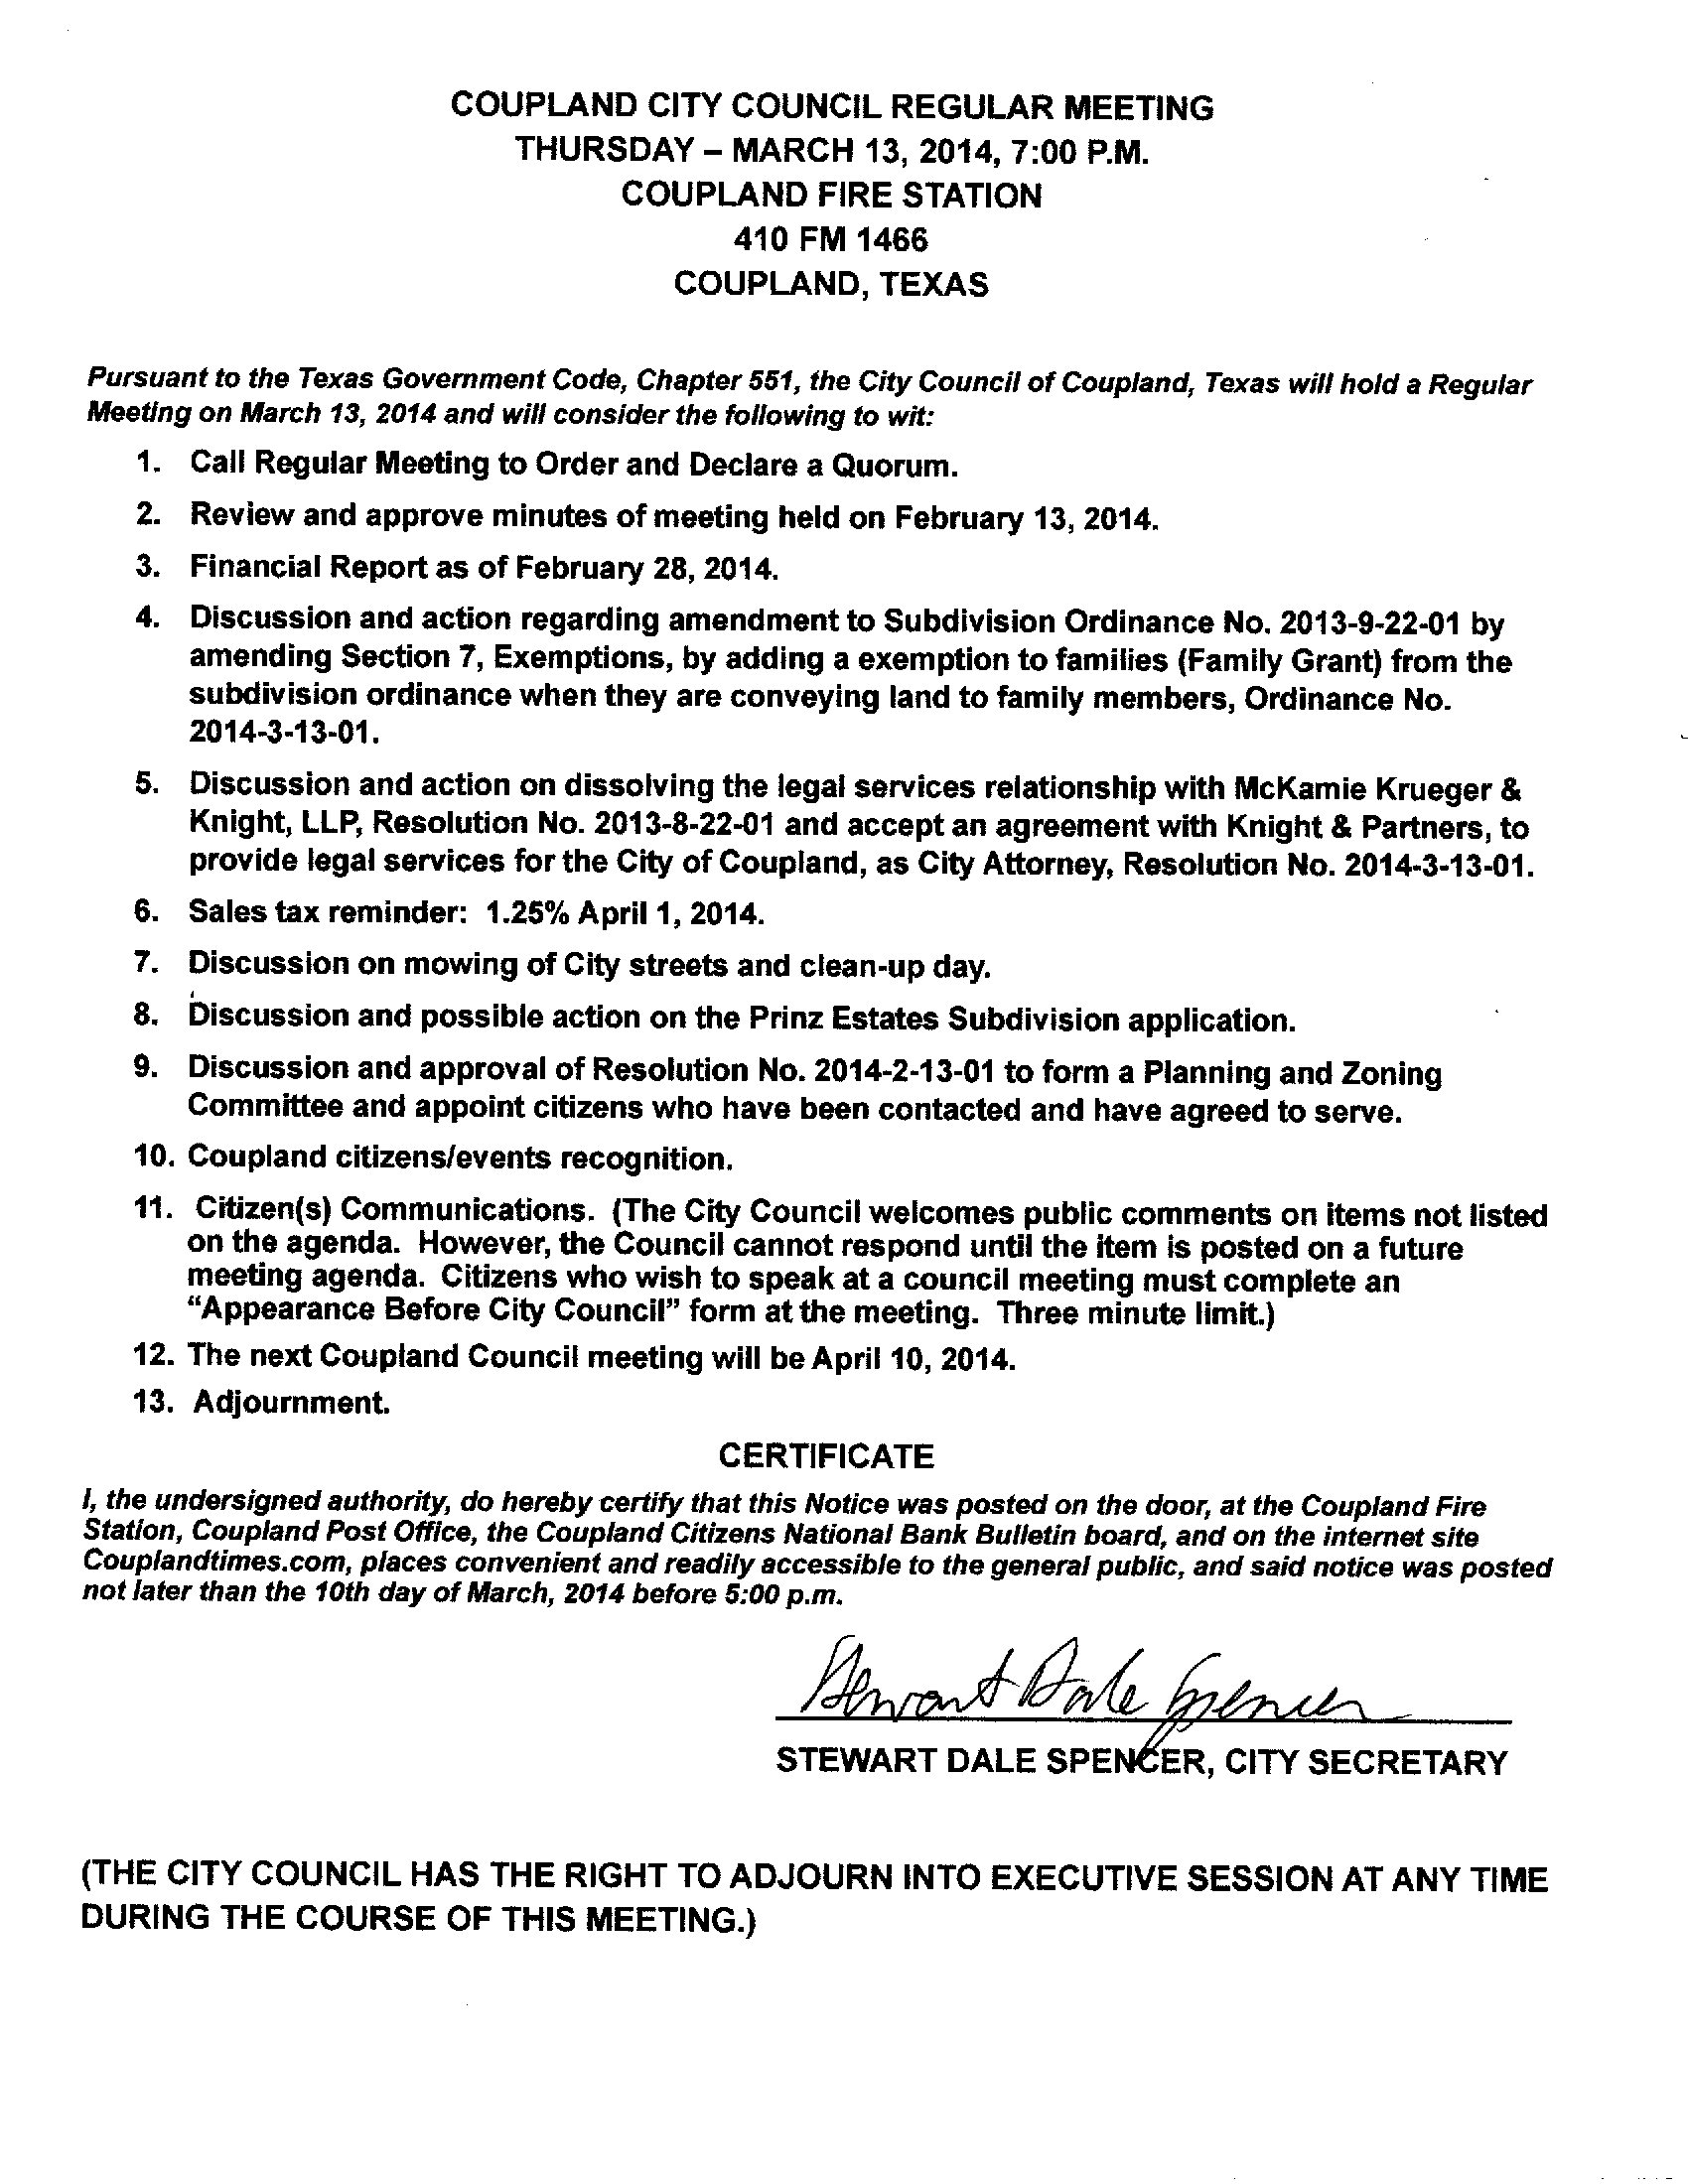 Regular Meeting Agenda - March 13, 2013